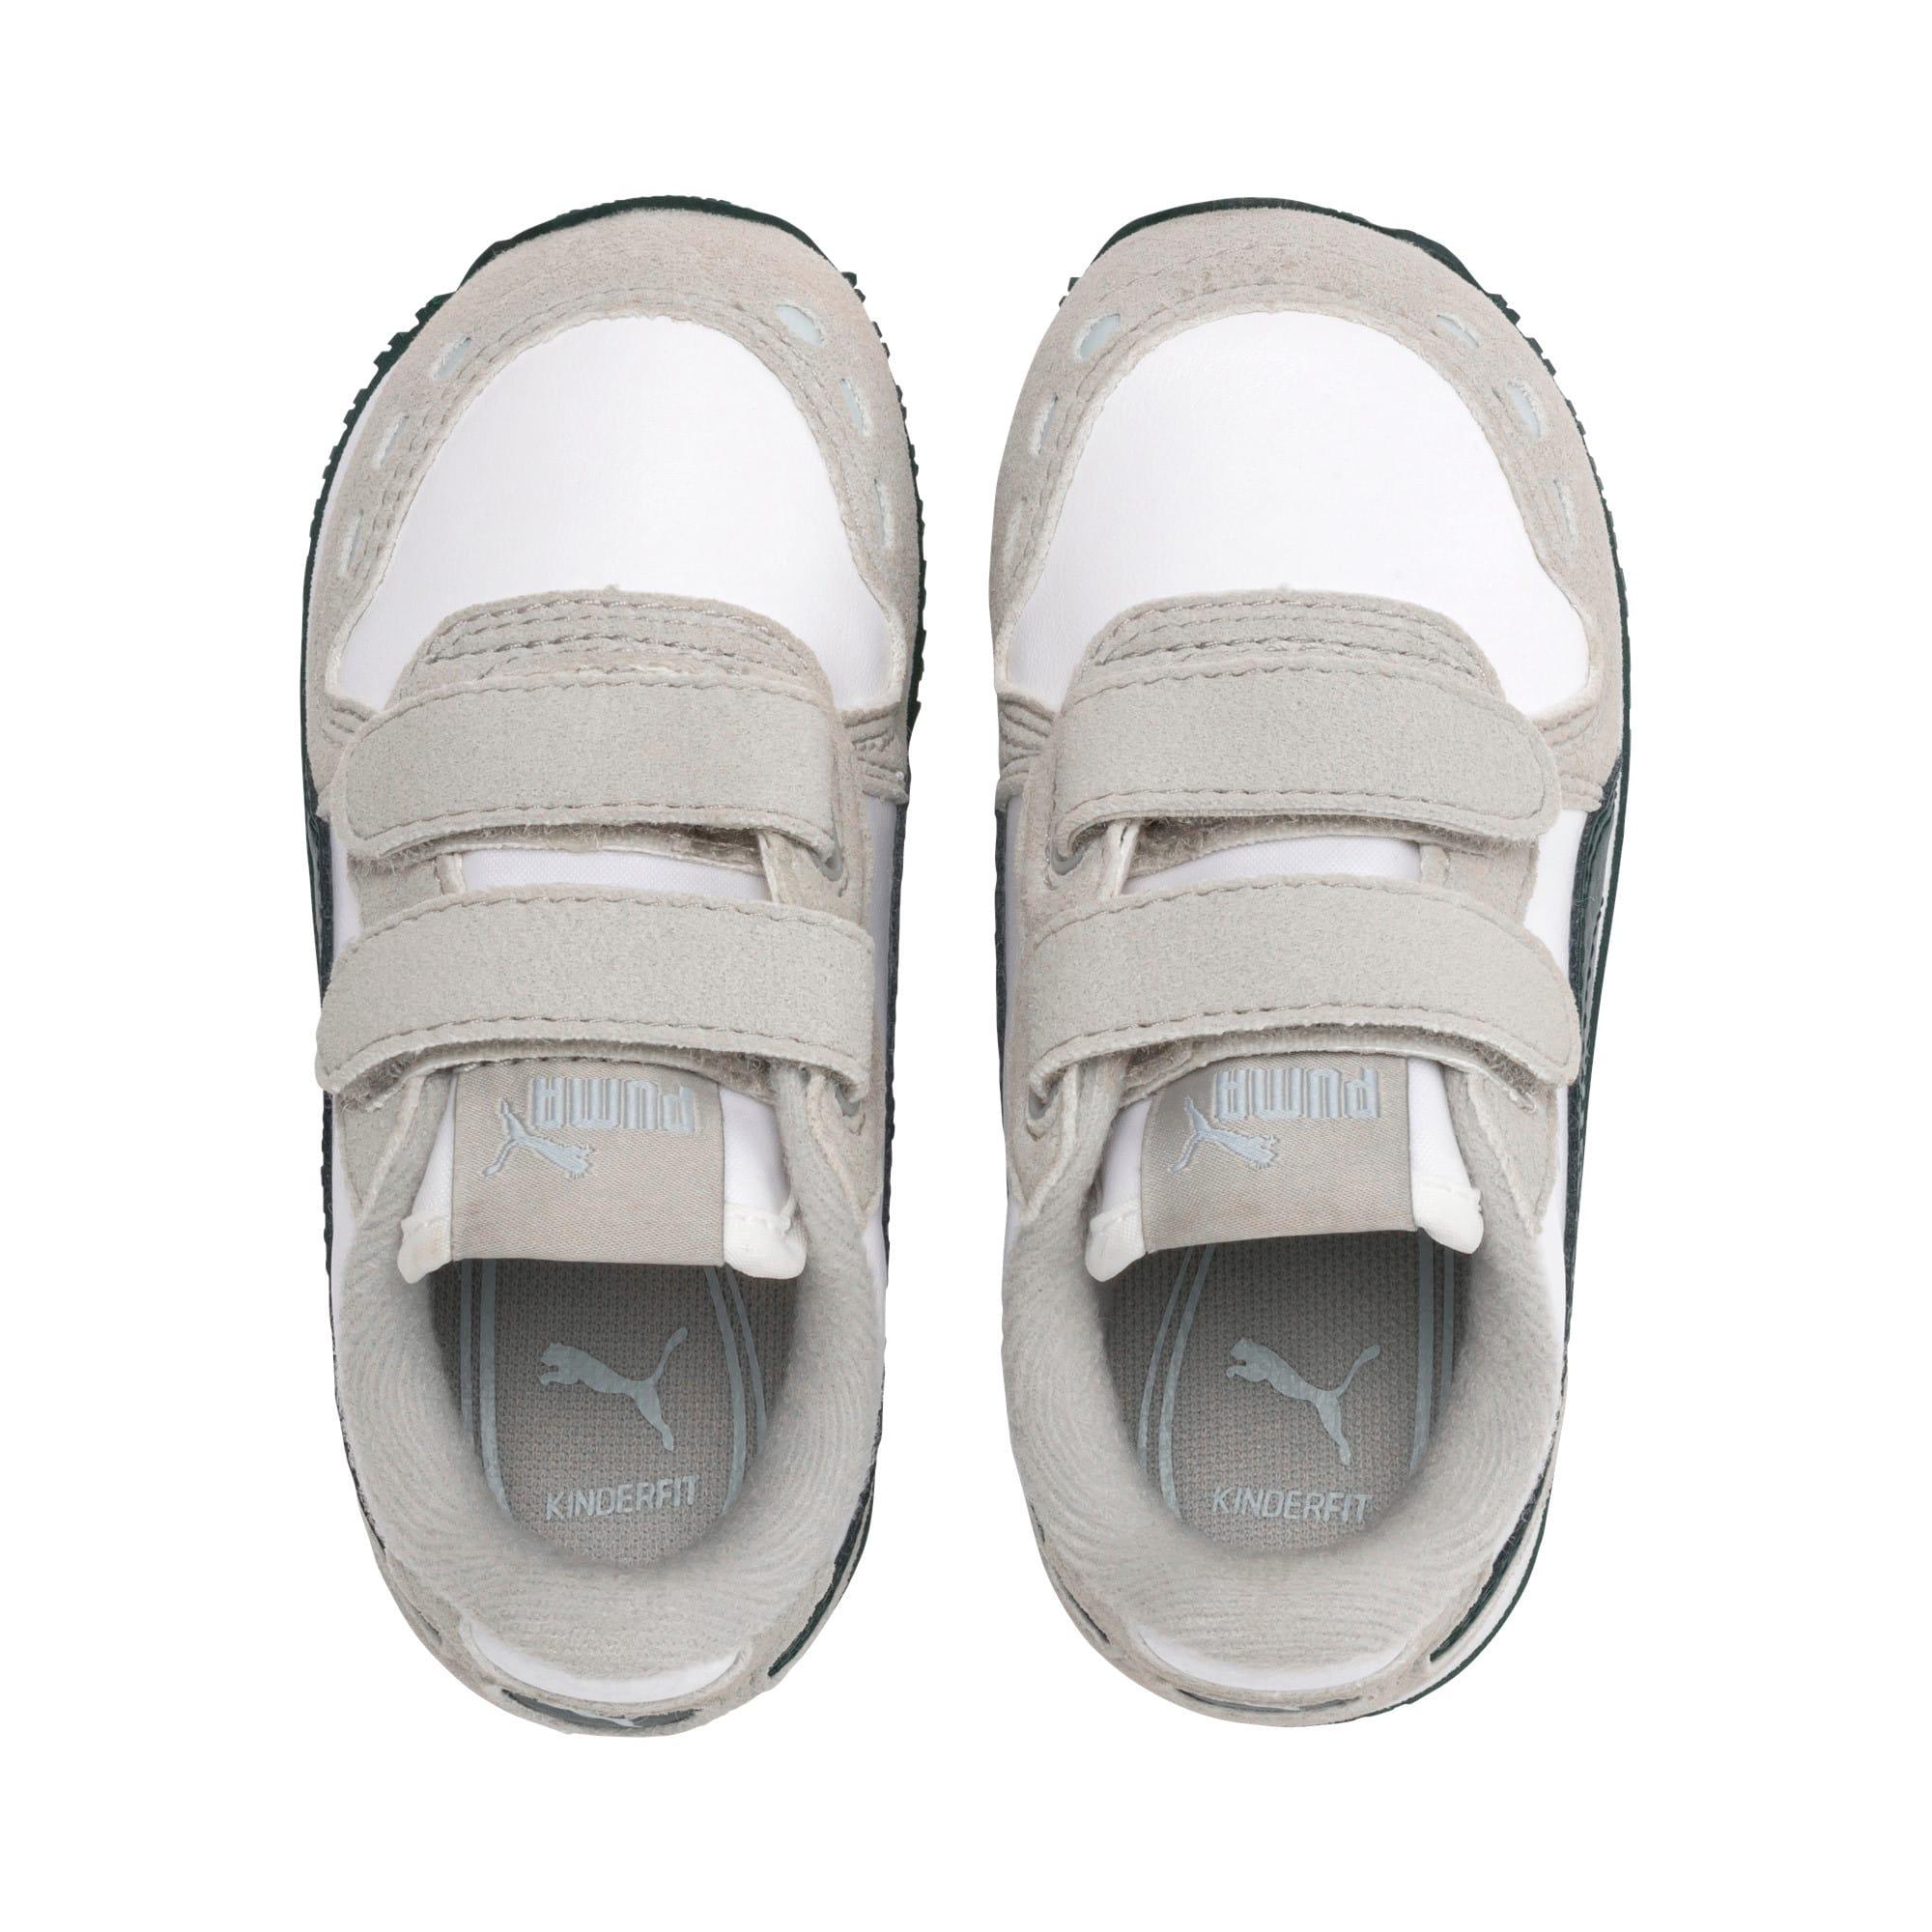 Thumbnail 6 of Cabana Racer SL Toddler Shoes, Puma White-Gray Violet, medium